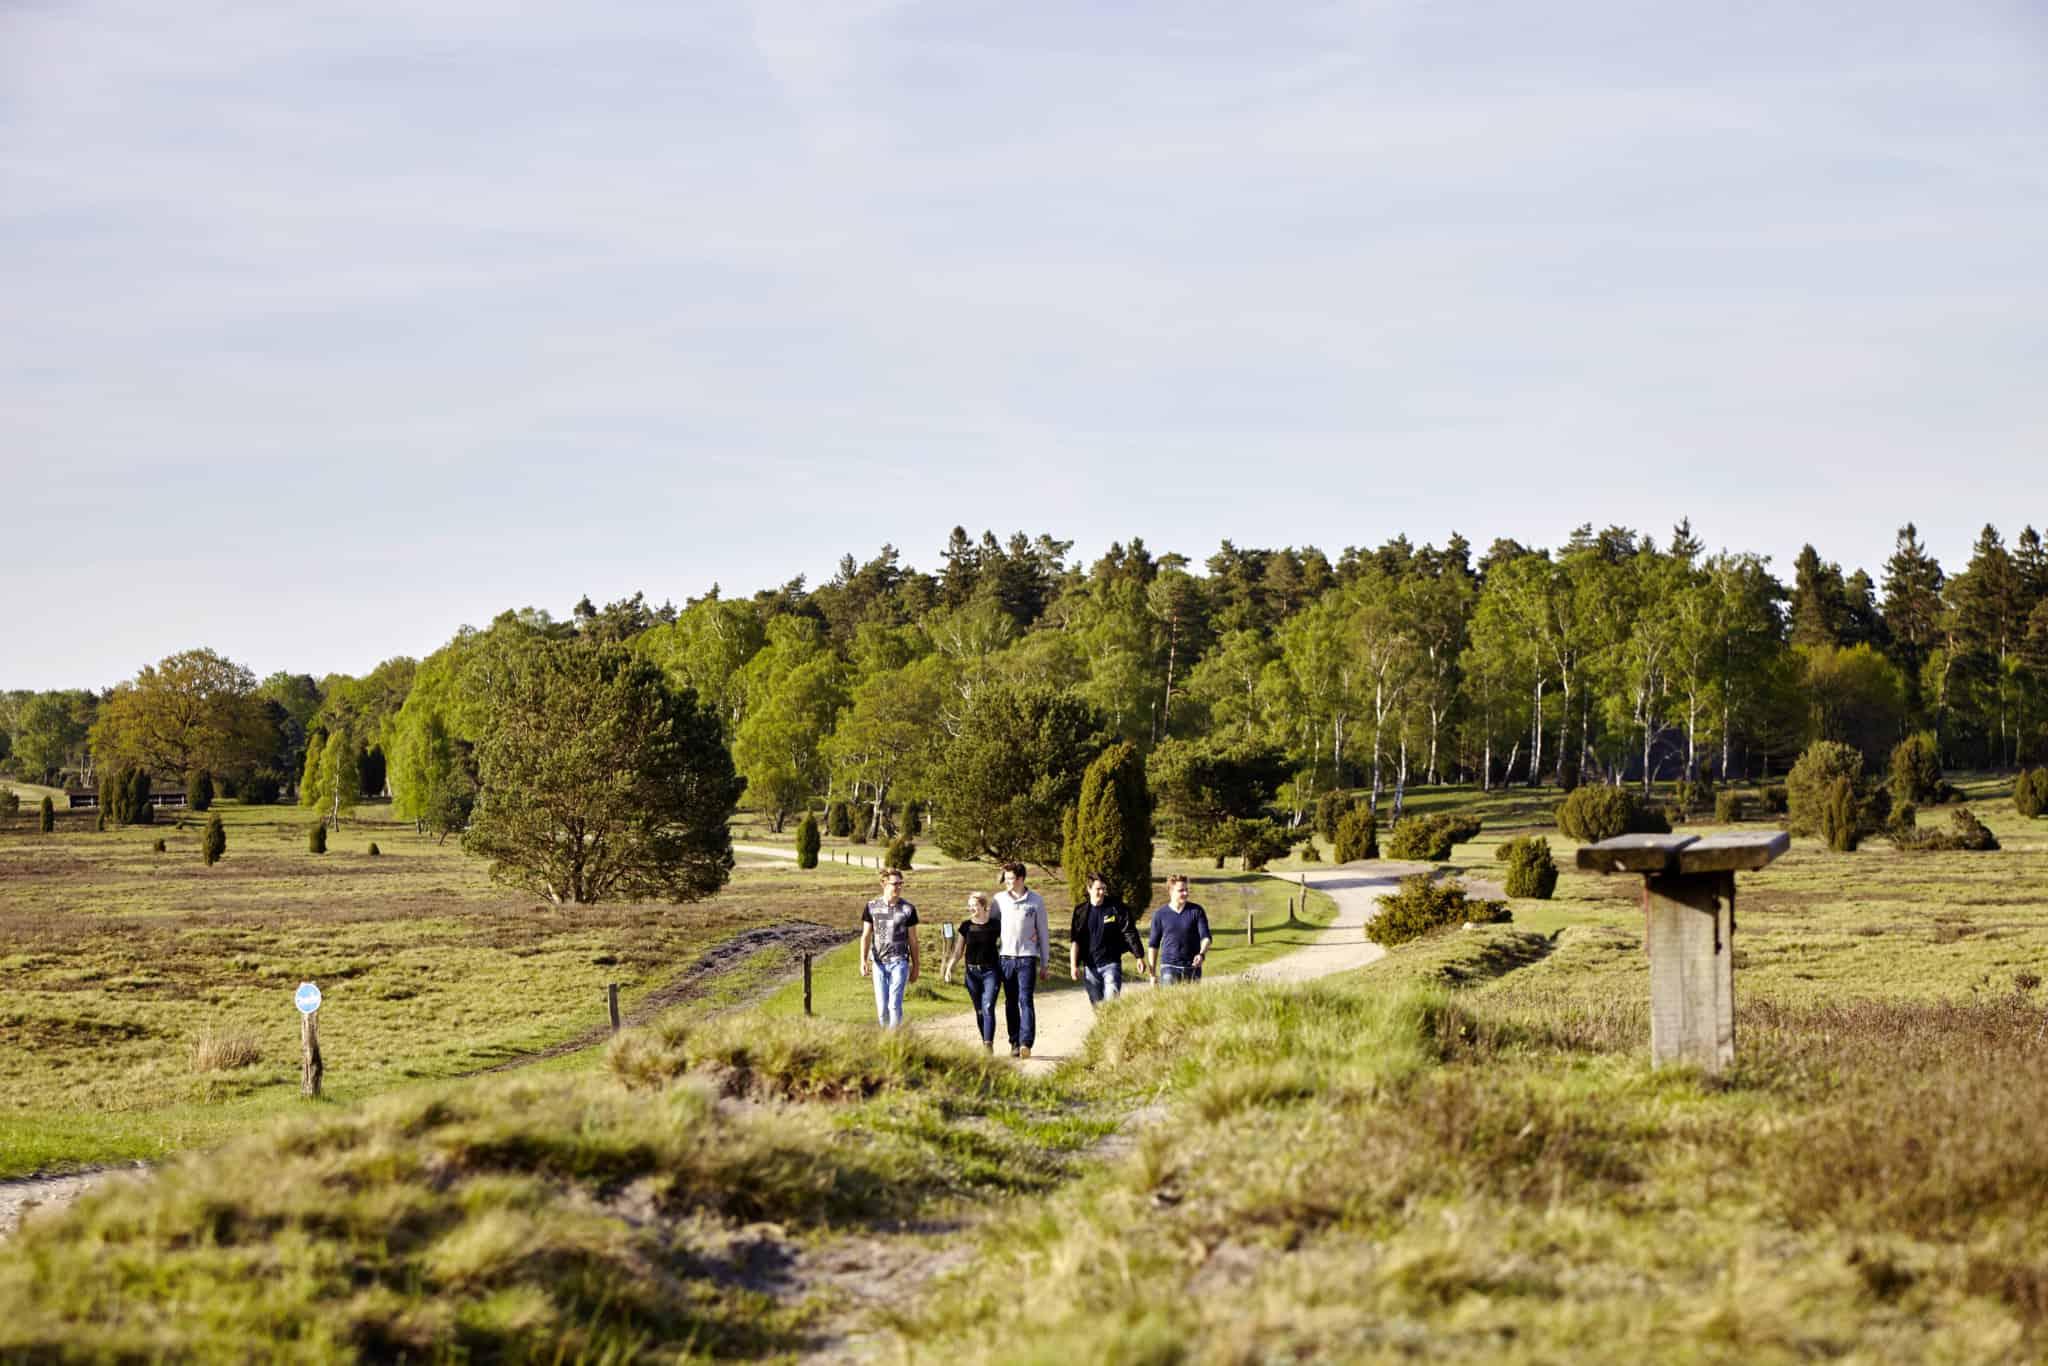 Wandern in der Lüneburger Heide (hier am Tütsberg) | Foto: Christian Burmester